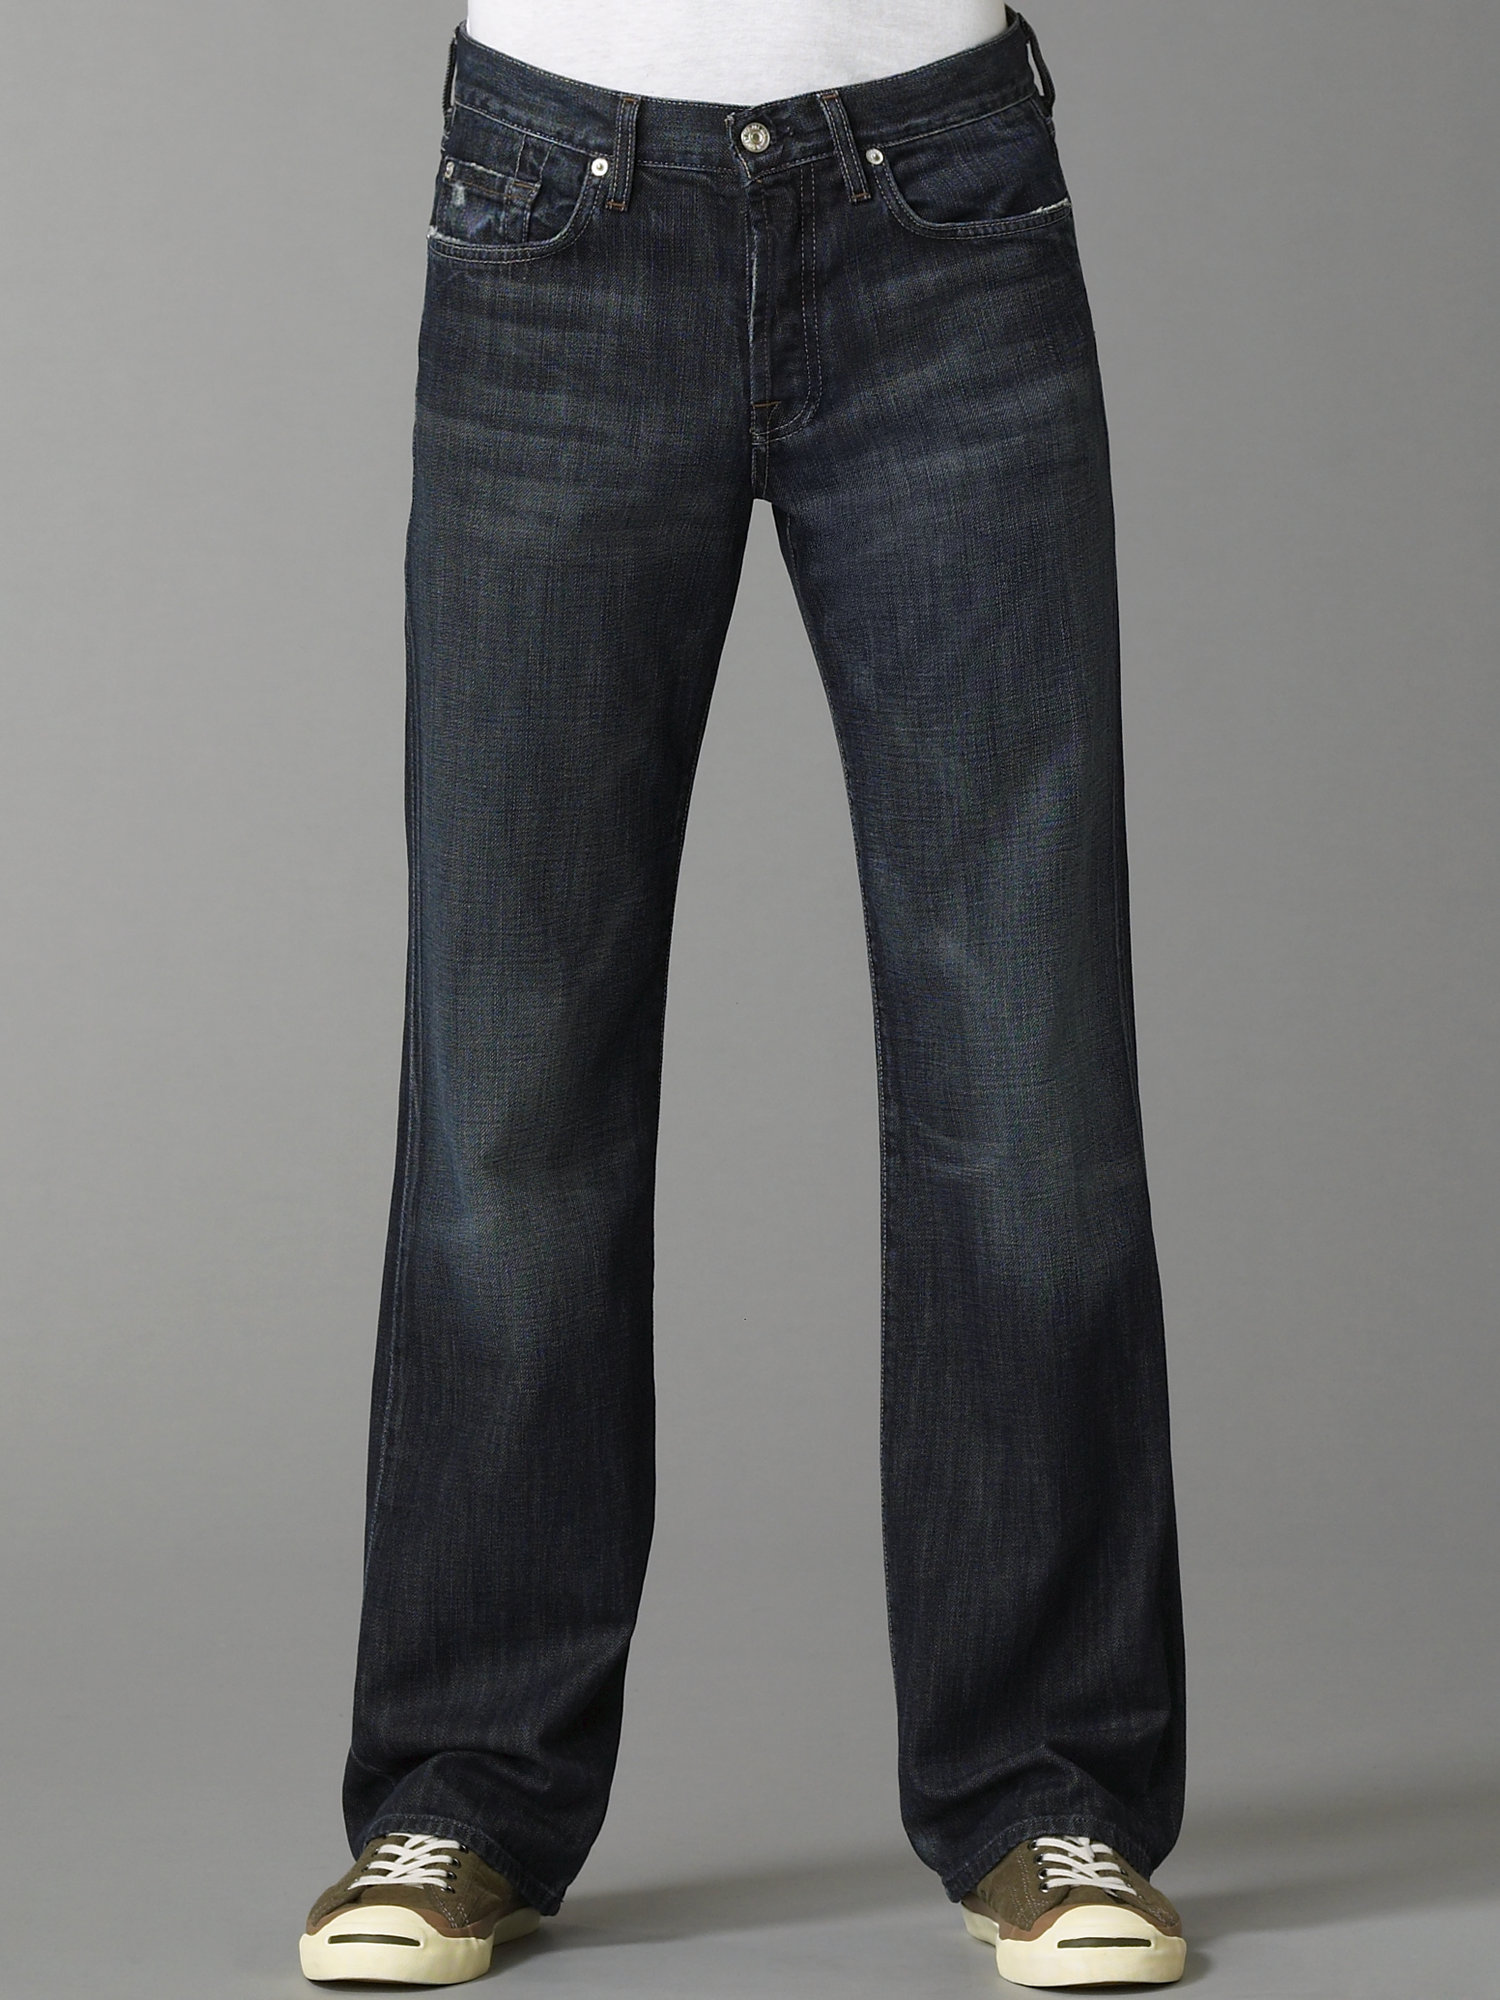 for all mankind montana straightleg jeans in blue for men lyst. Black Bedroom Furniture Sets. Home Design Ideas